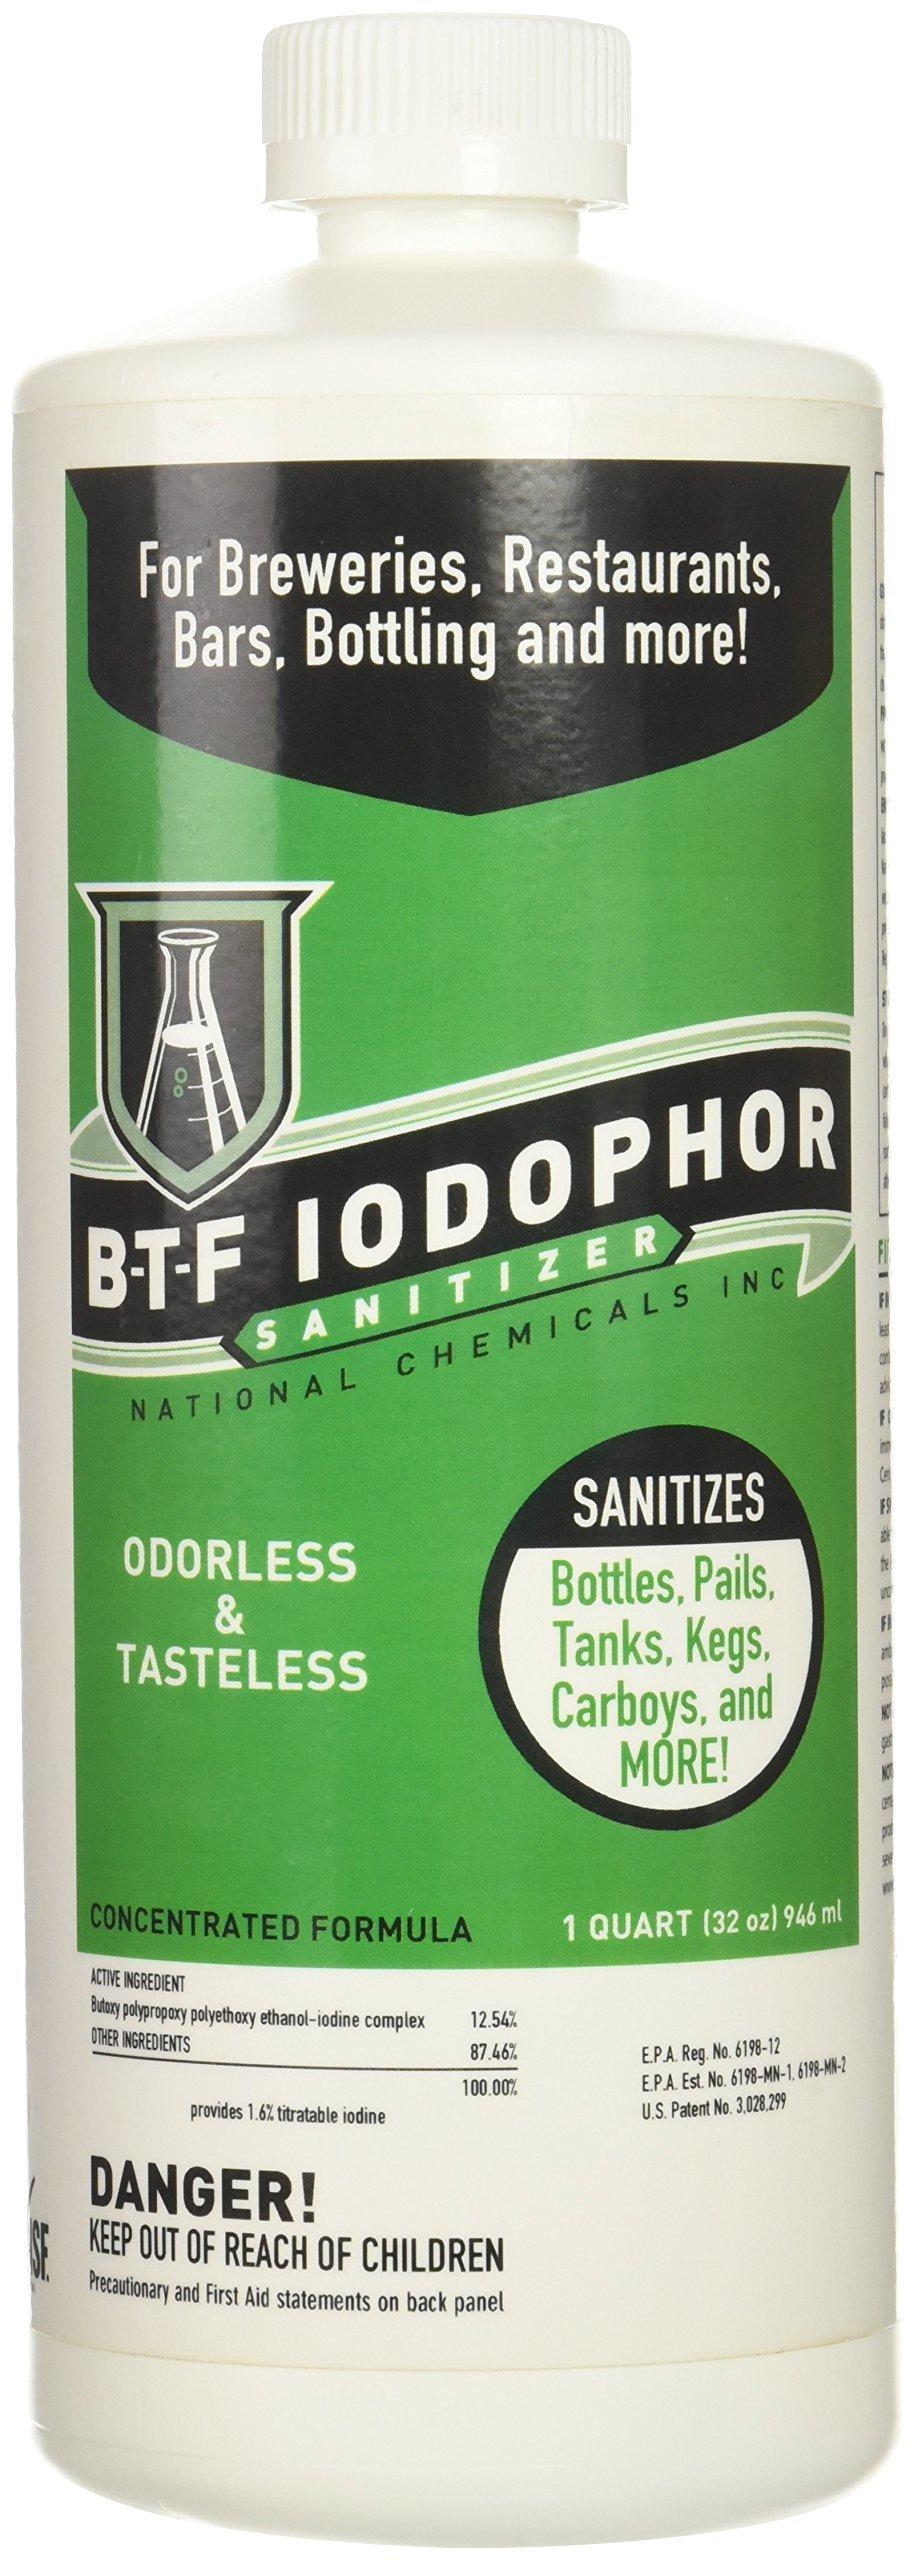 BTF Iodophor Sanitizer 32 oz